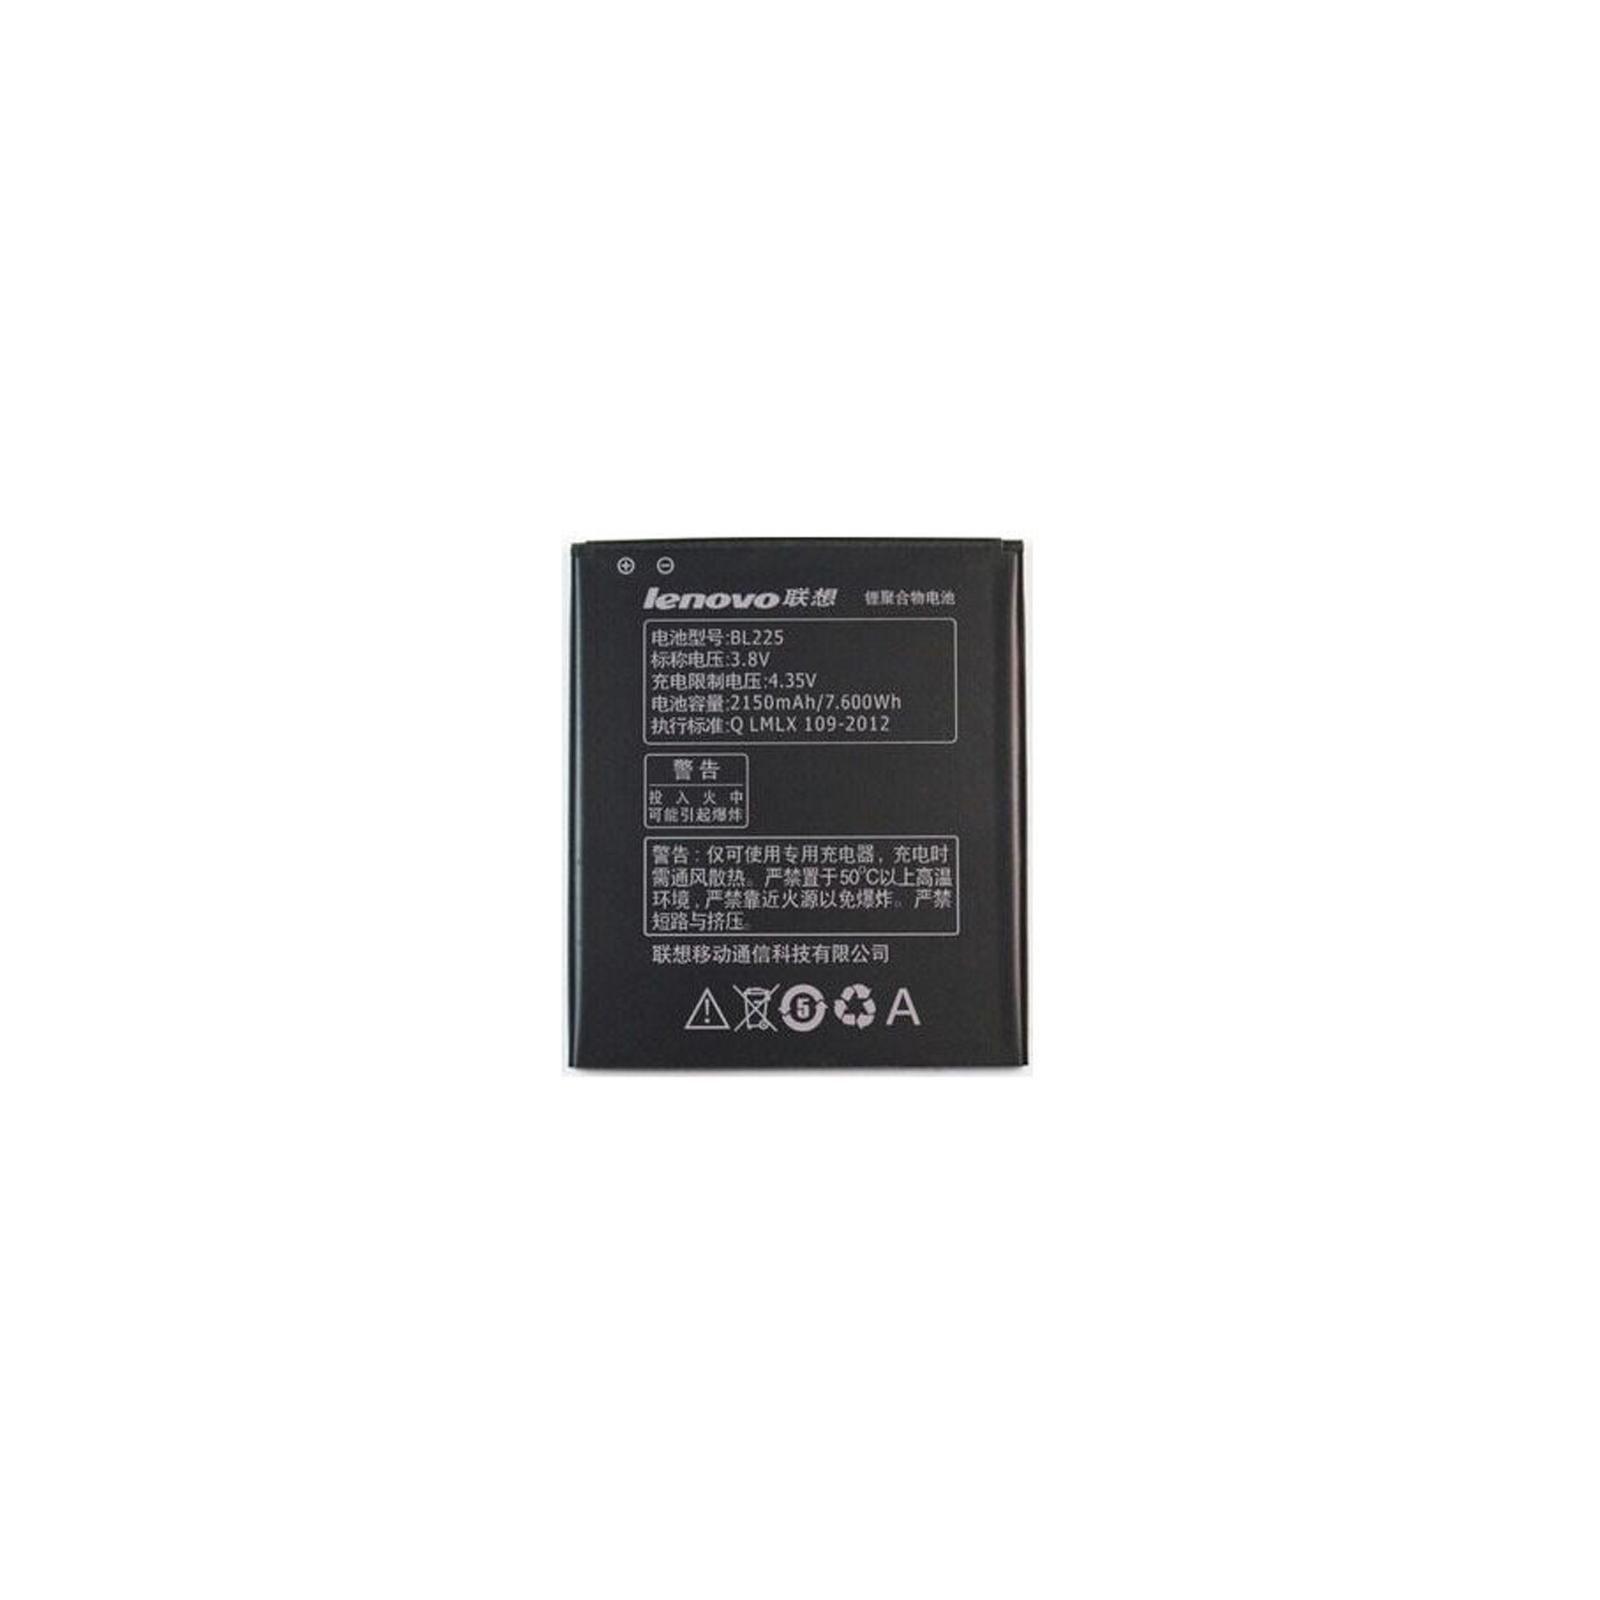 Аккумуляторная батарея Lenovo for S580 (BL-225 / 40957)